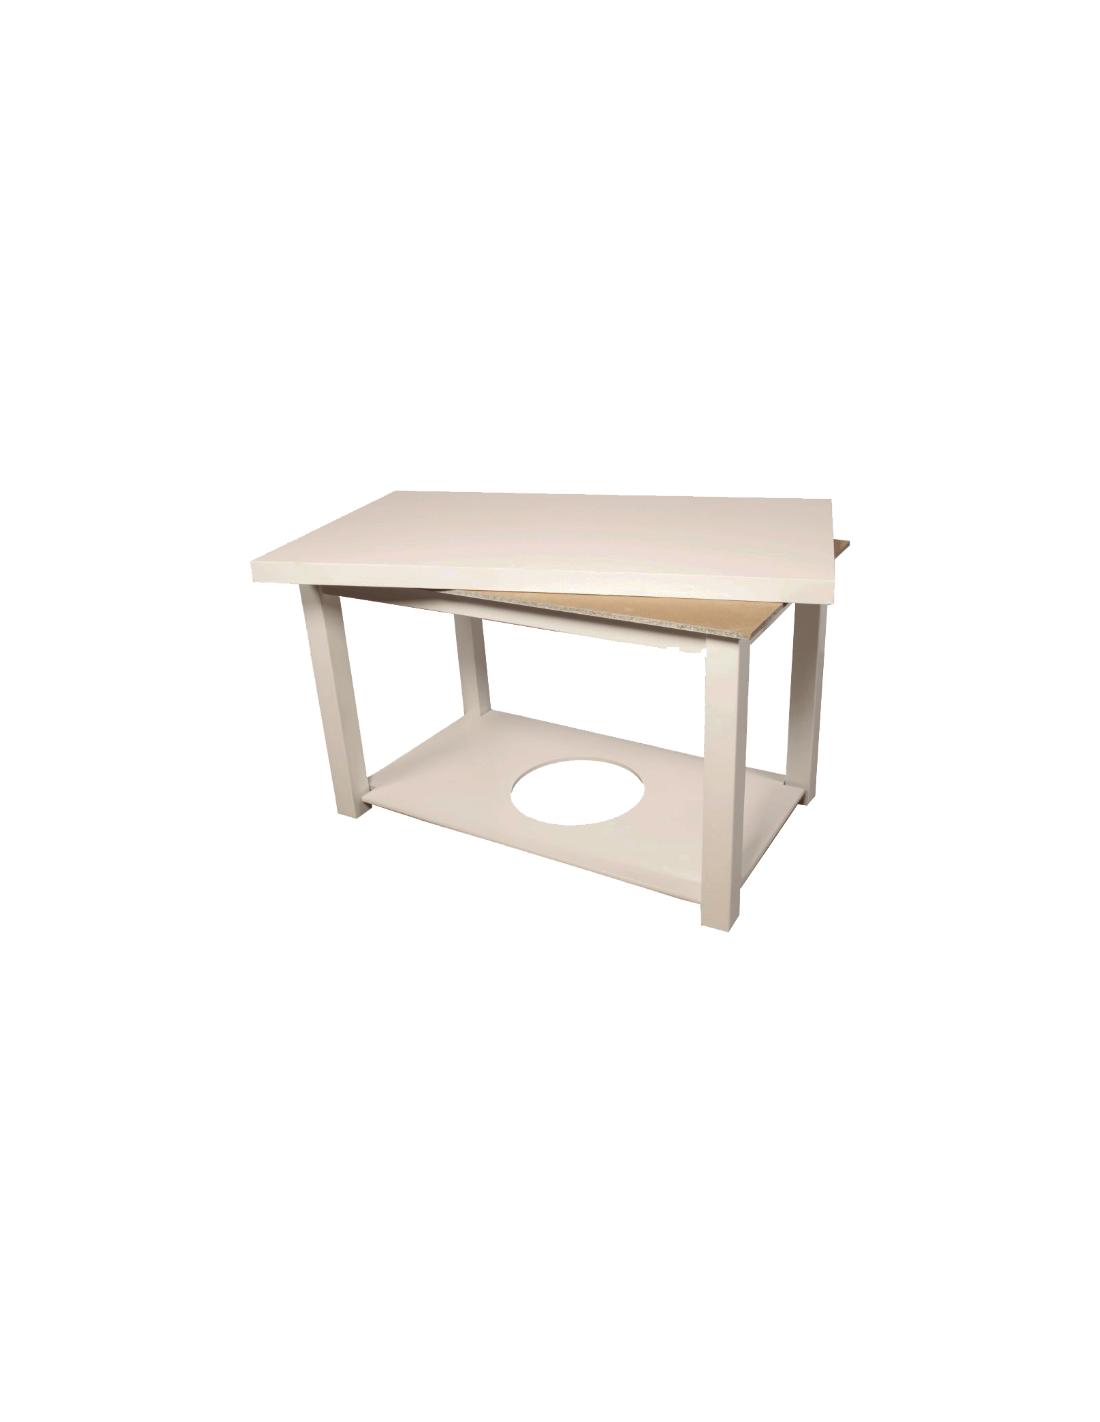 Chaise longues 2 plazas reclinable arcon 4 puff tela antimanchas 240 cm decopaq - Sofa 4 plazas chaise longue ...